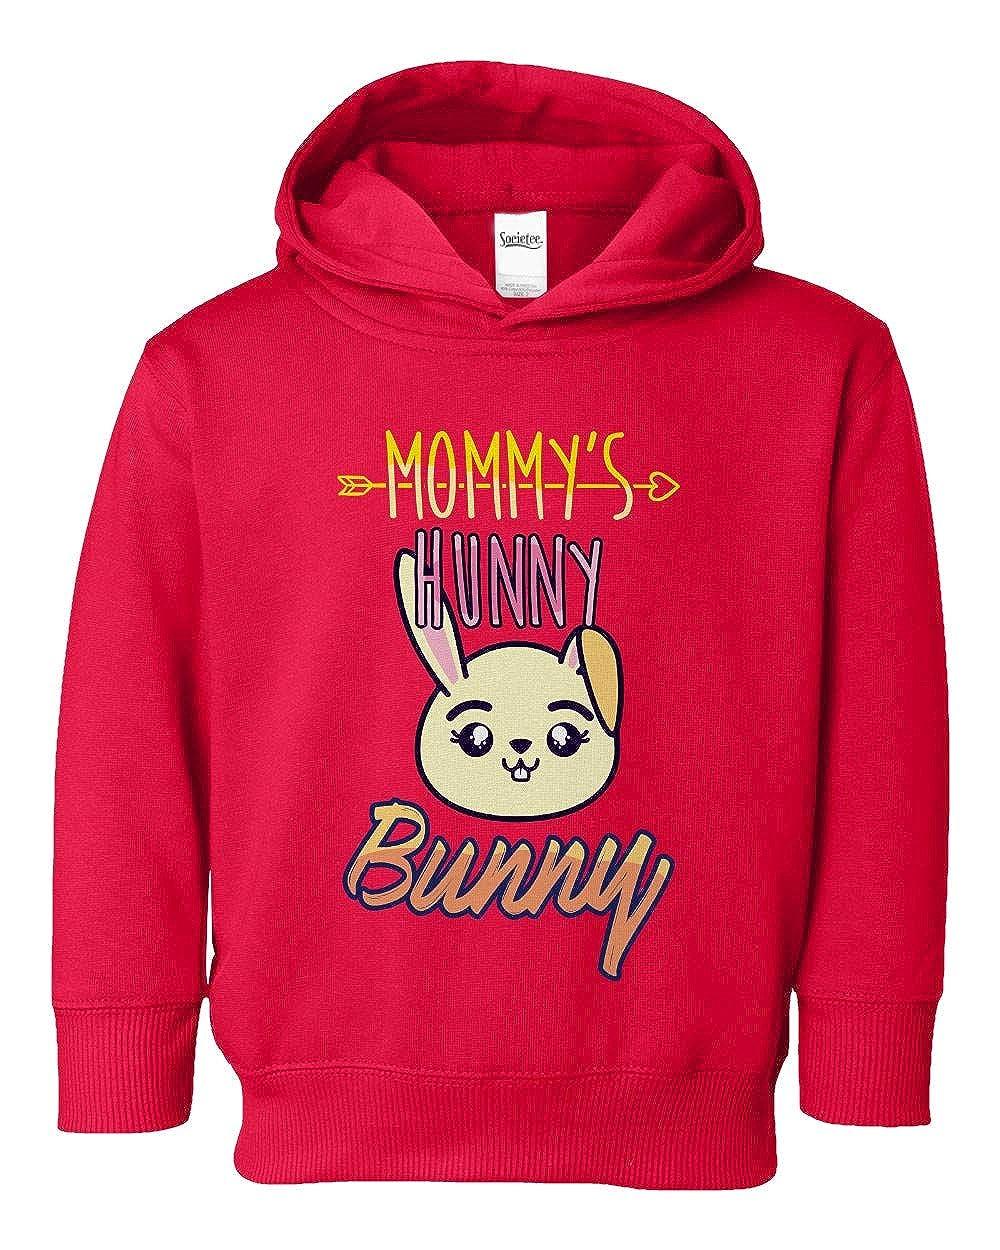 Societee Mommys Hunny Bunny Adorable Girls Boys Toddler Hooded Sweatshirt